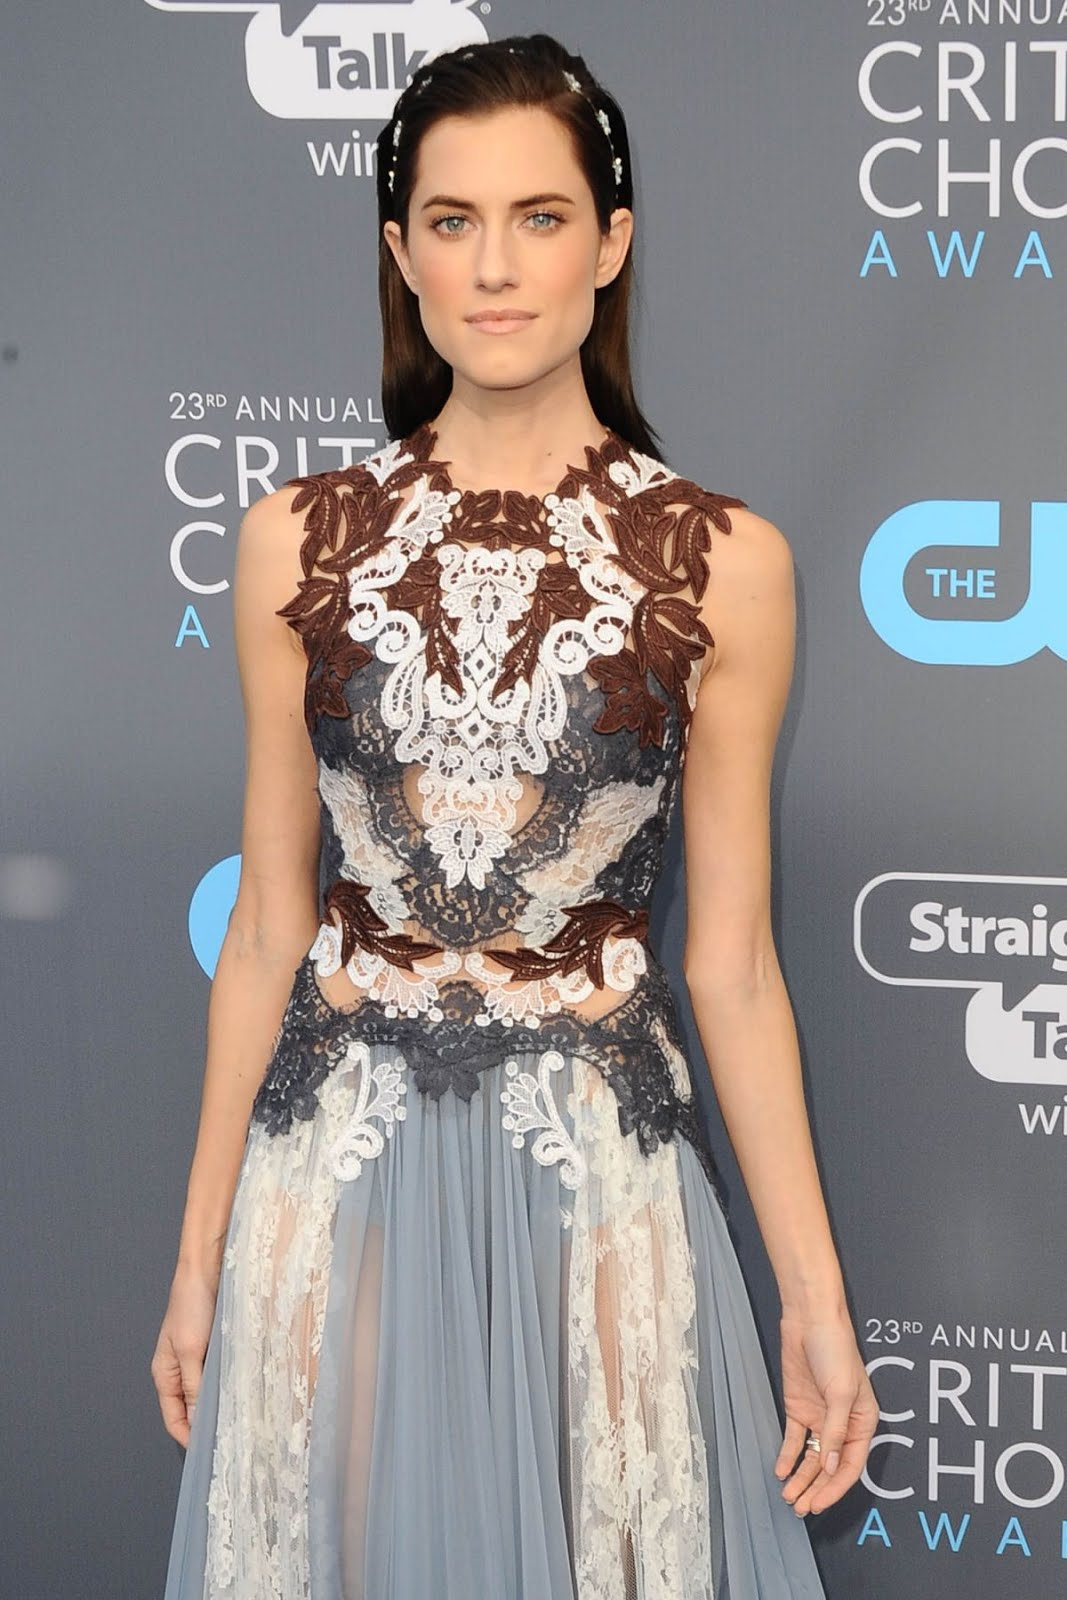 Allison Williams in chocolate dress at 2018 critics Choice Awards In Santa Monica